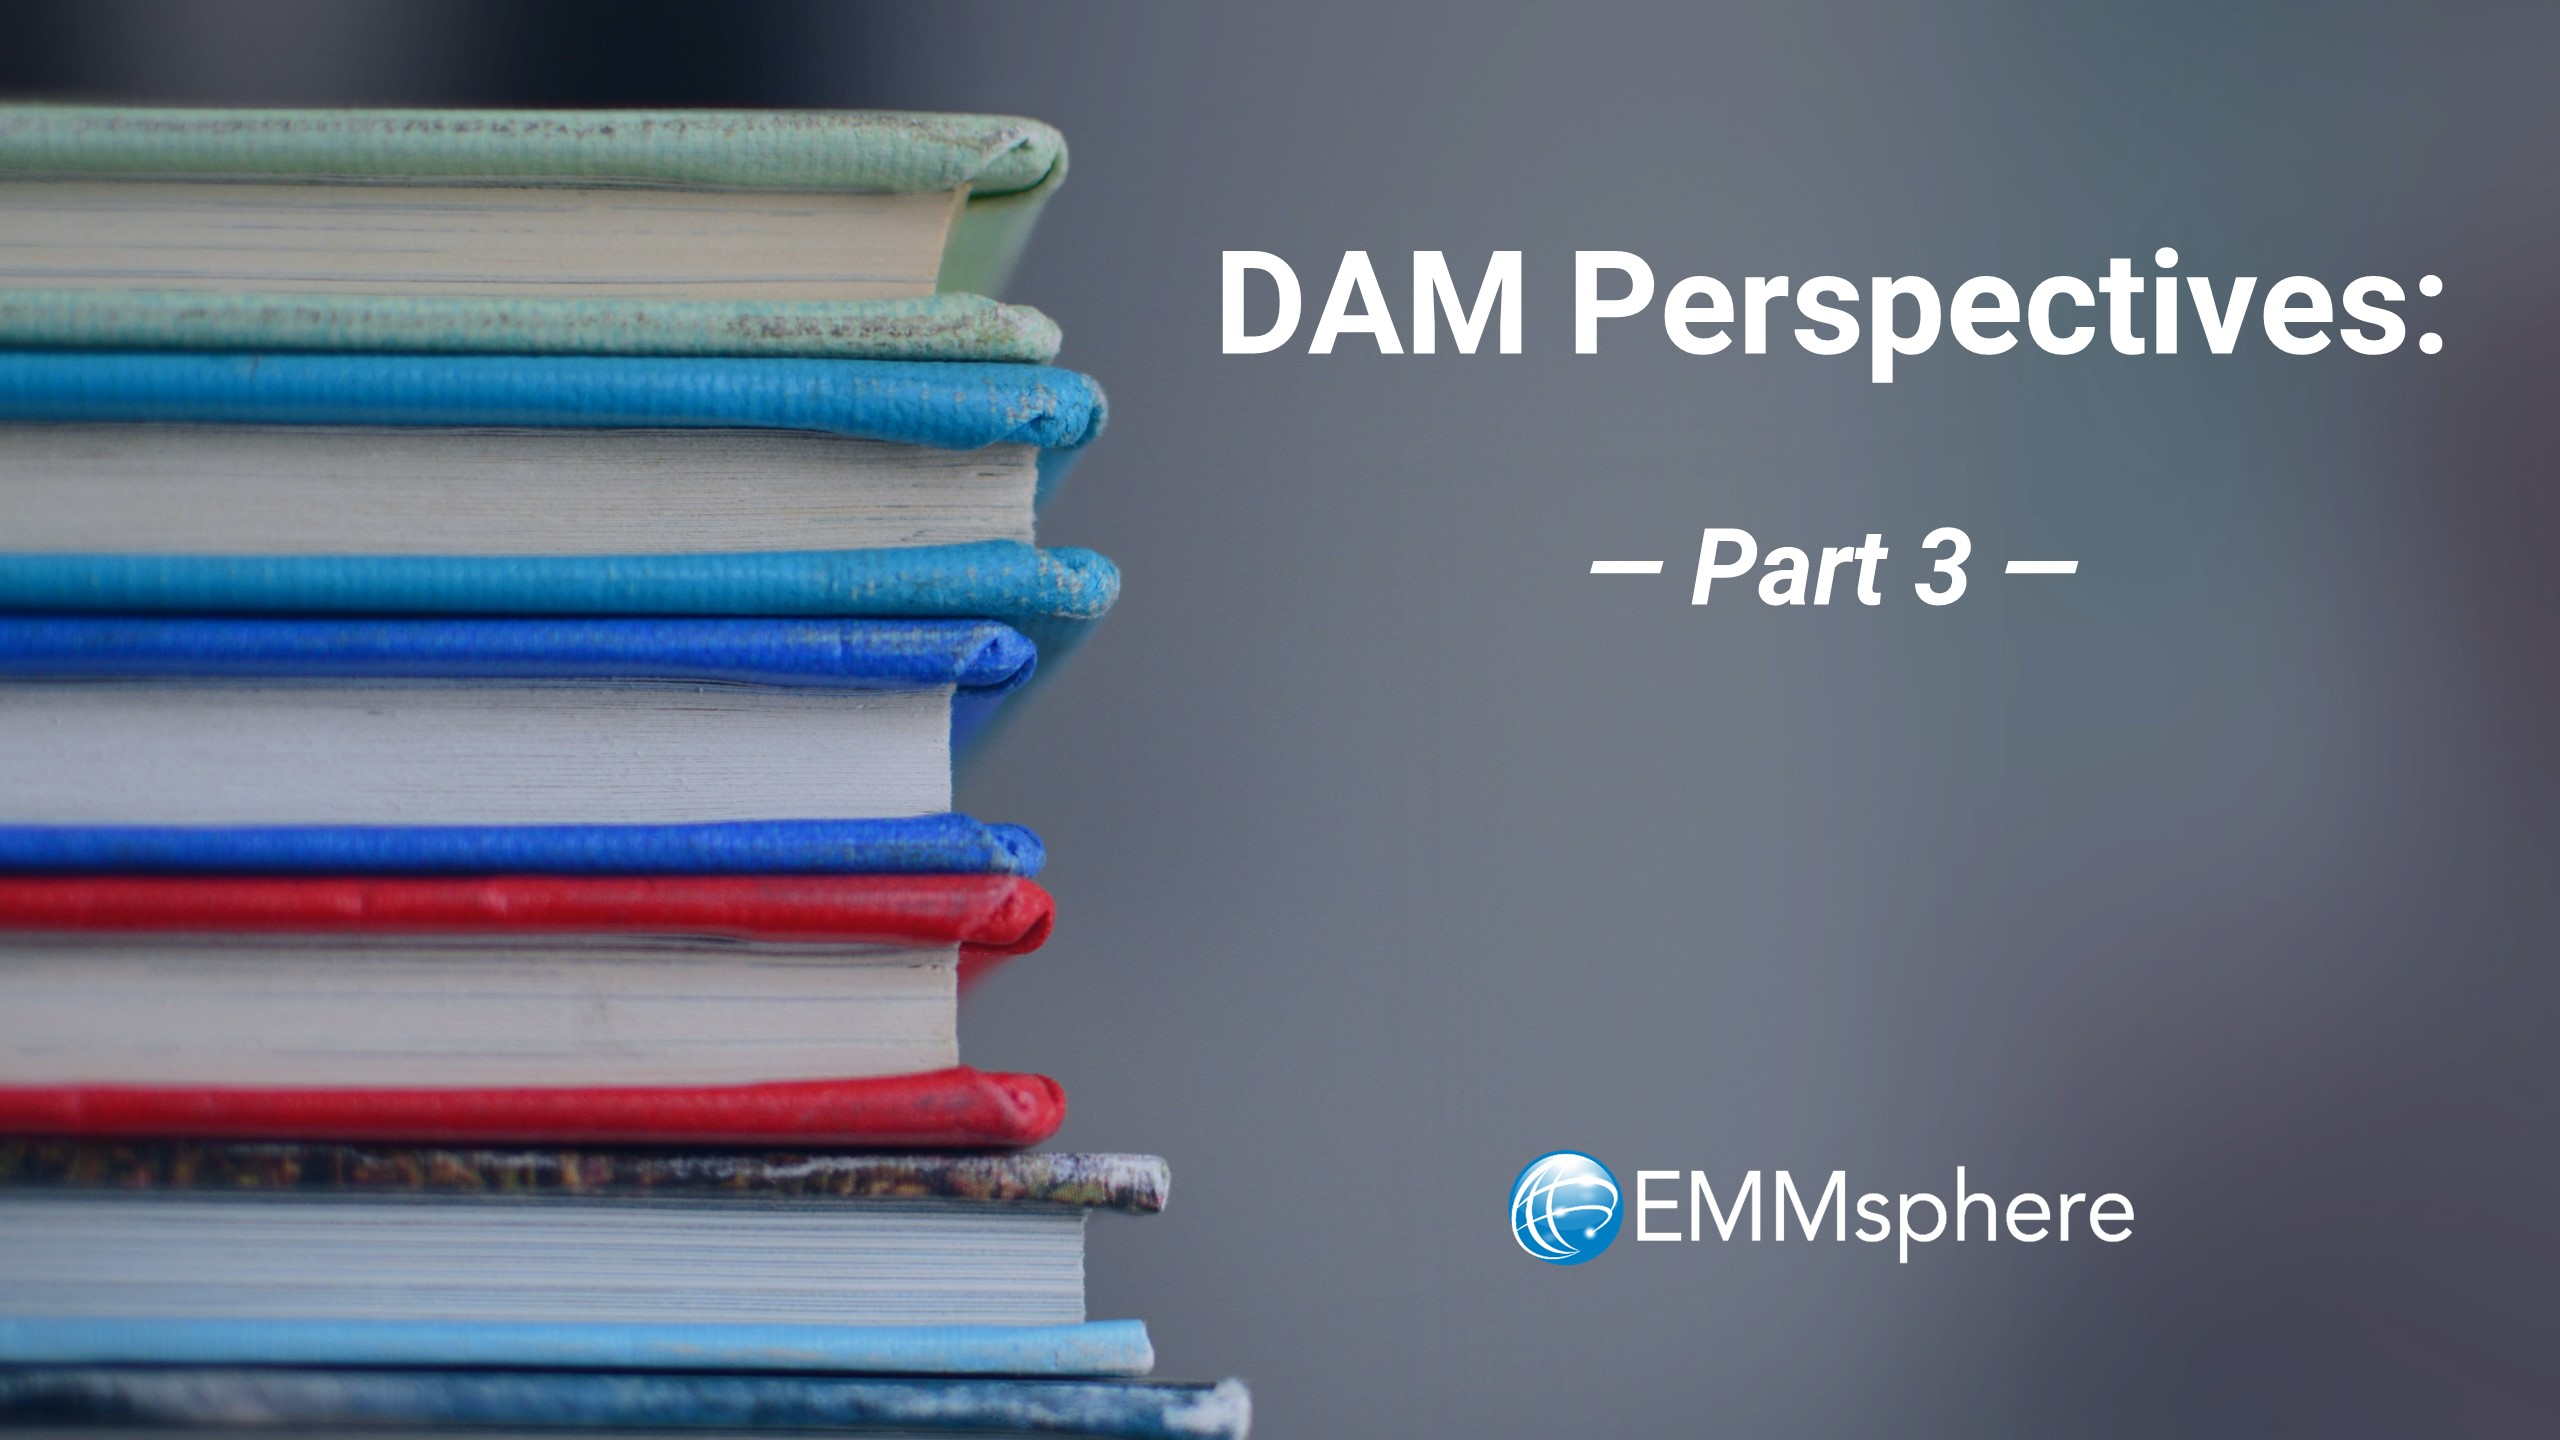 DAM Perspectives - Part 3